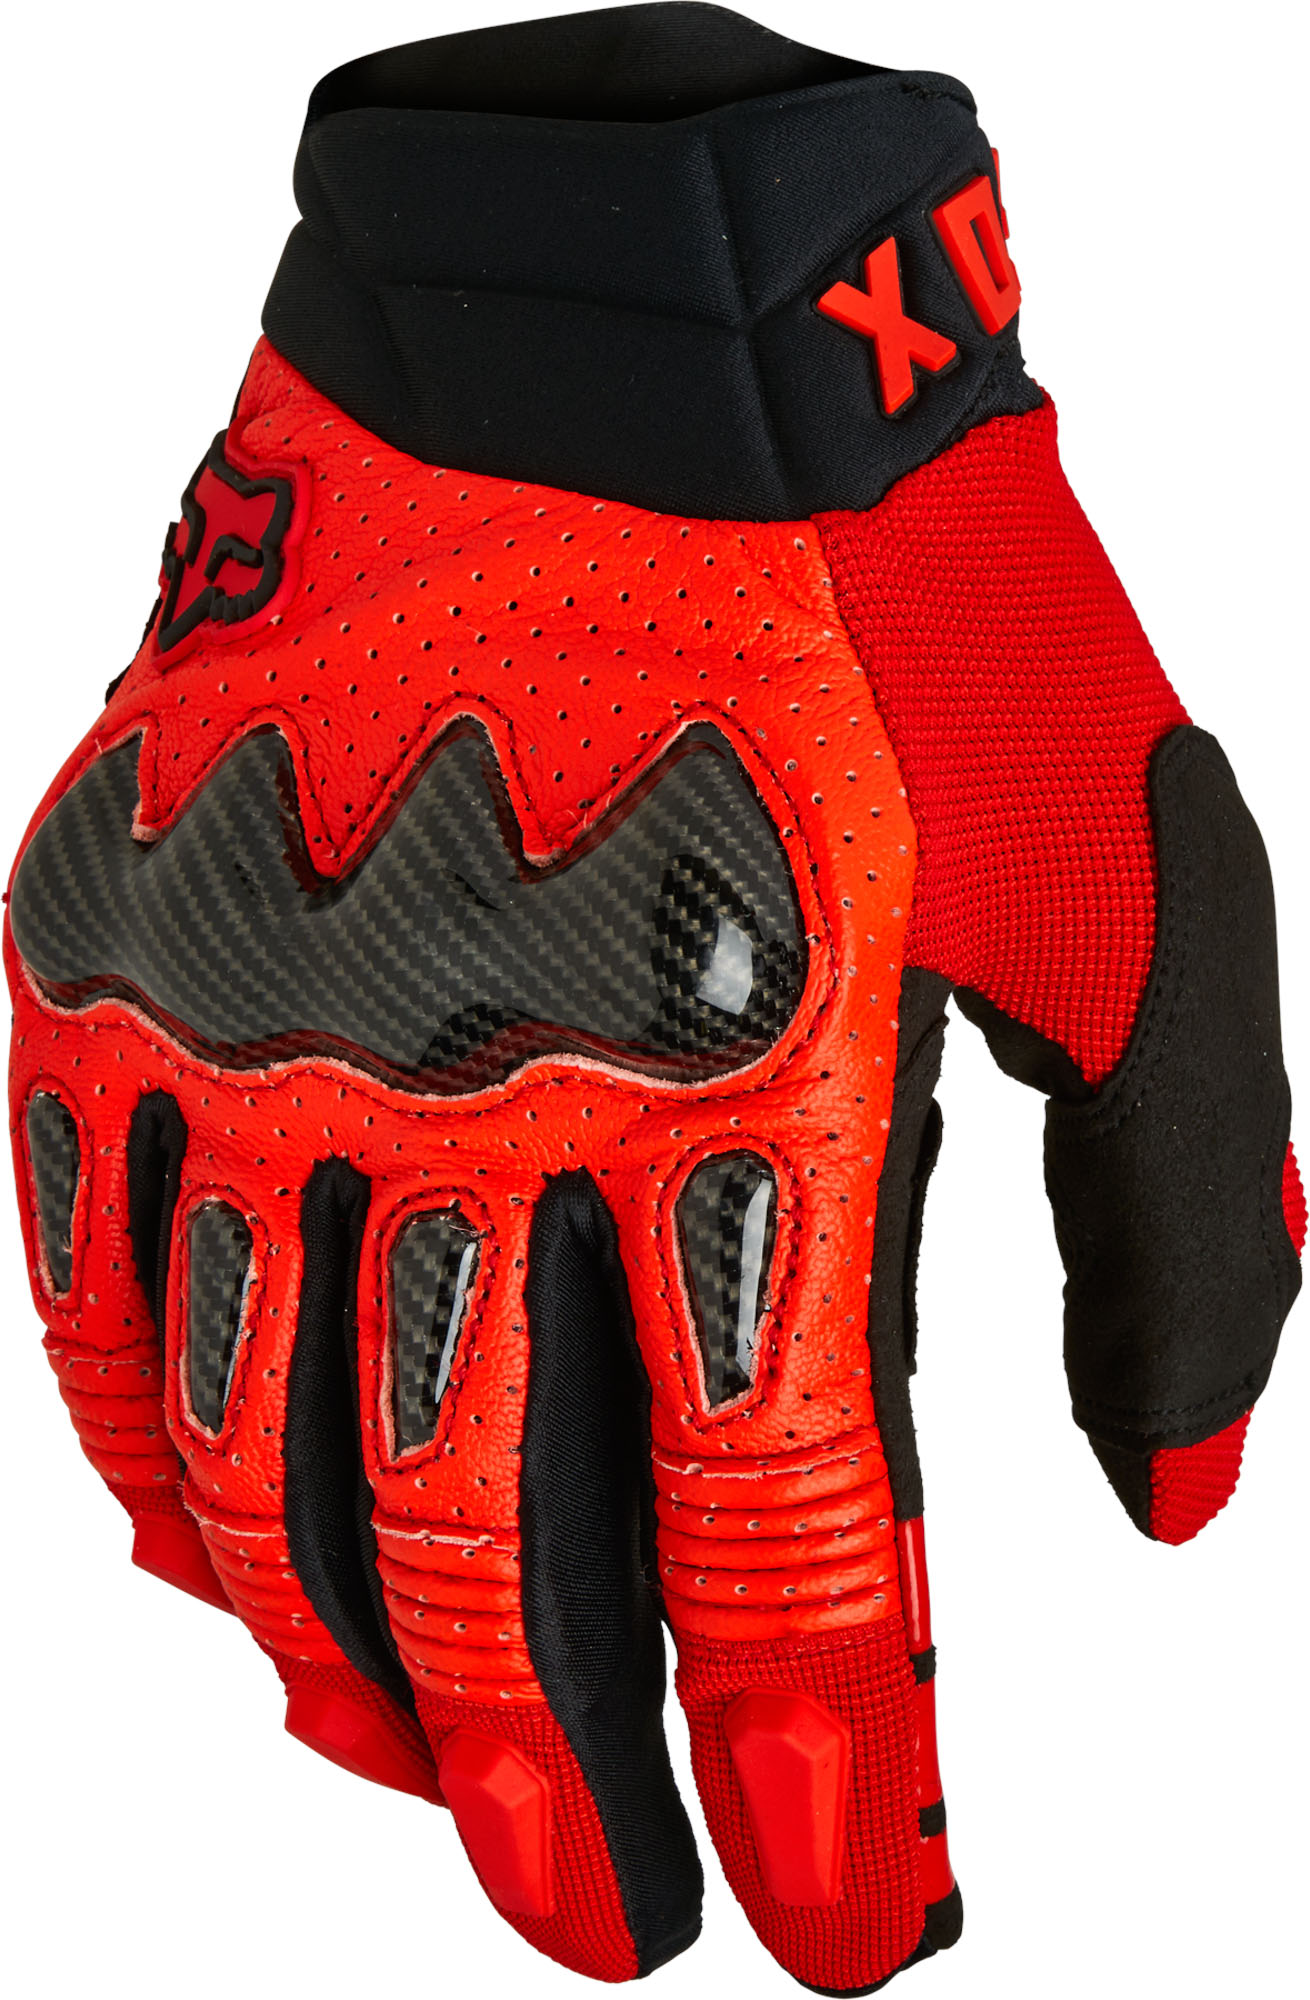 FOX Bomber Glove Ce - Fluo RED MX22